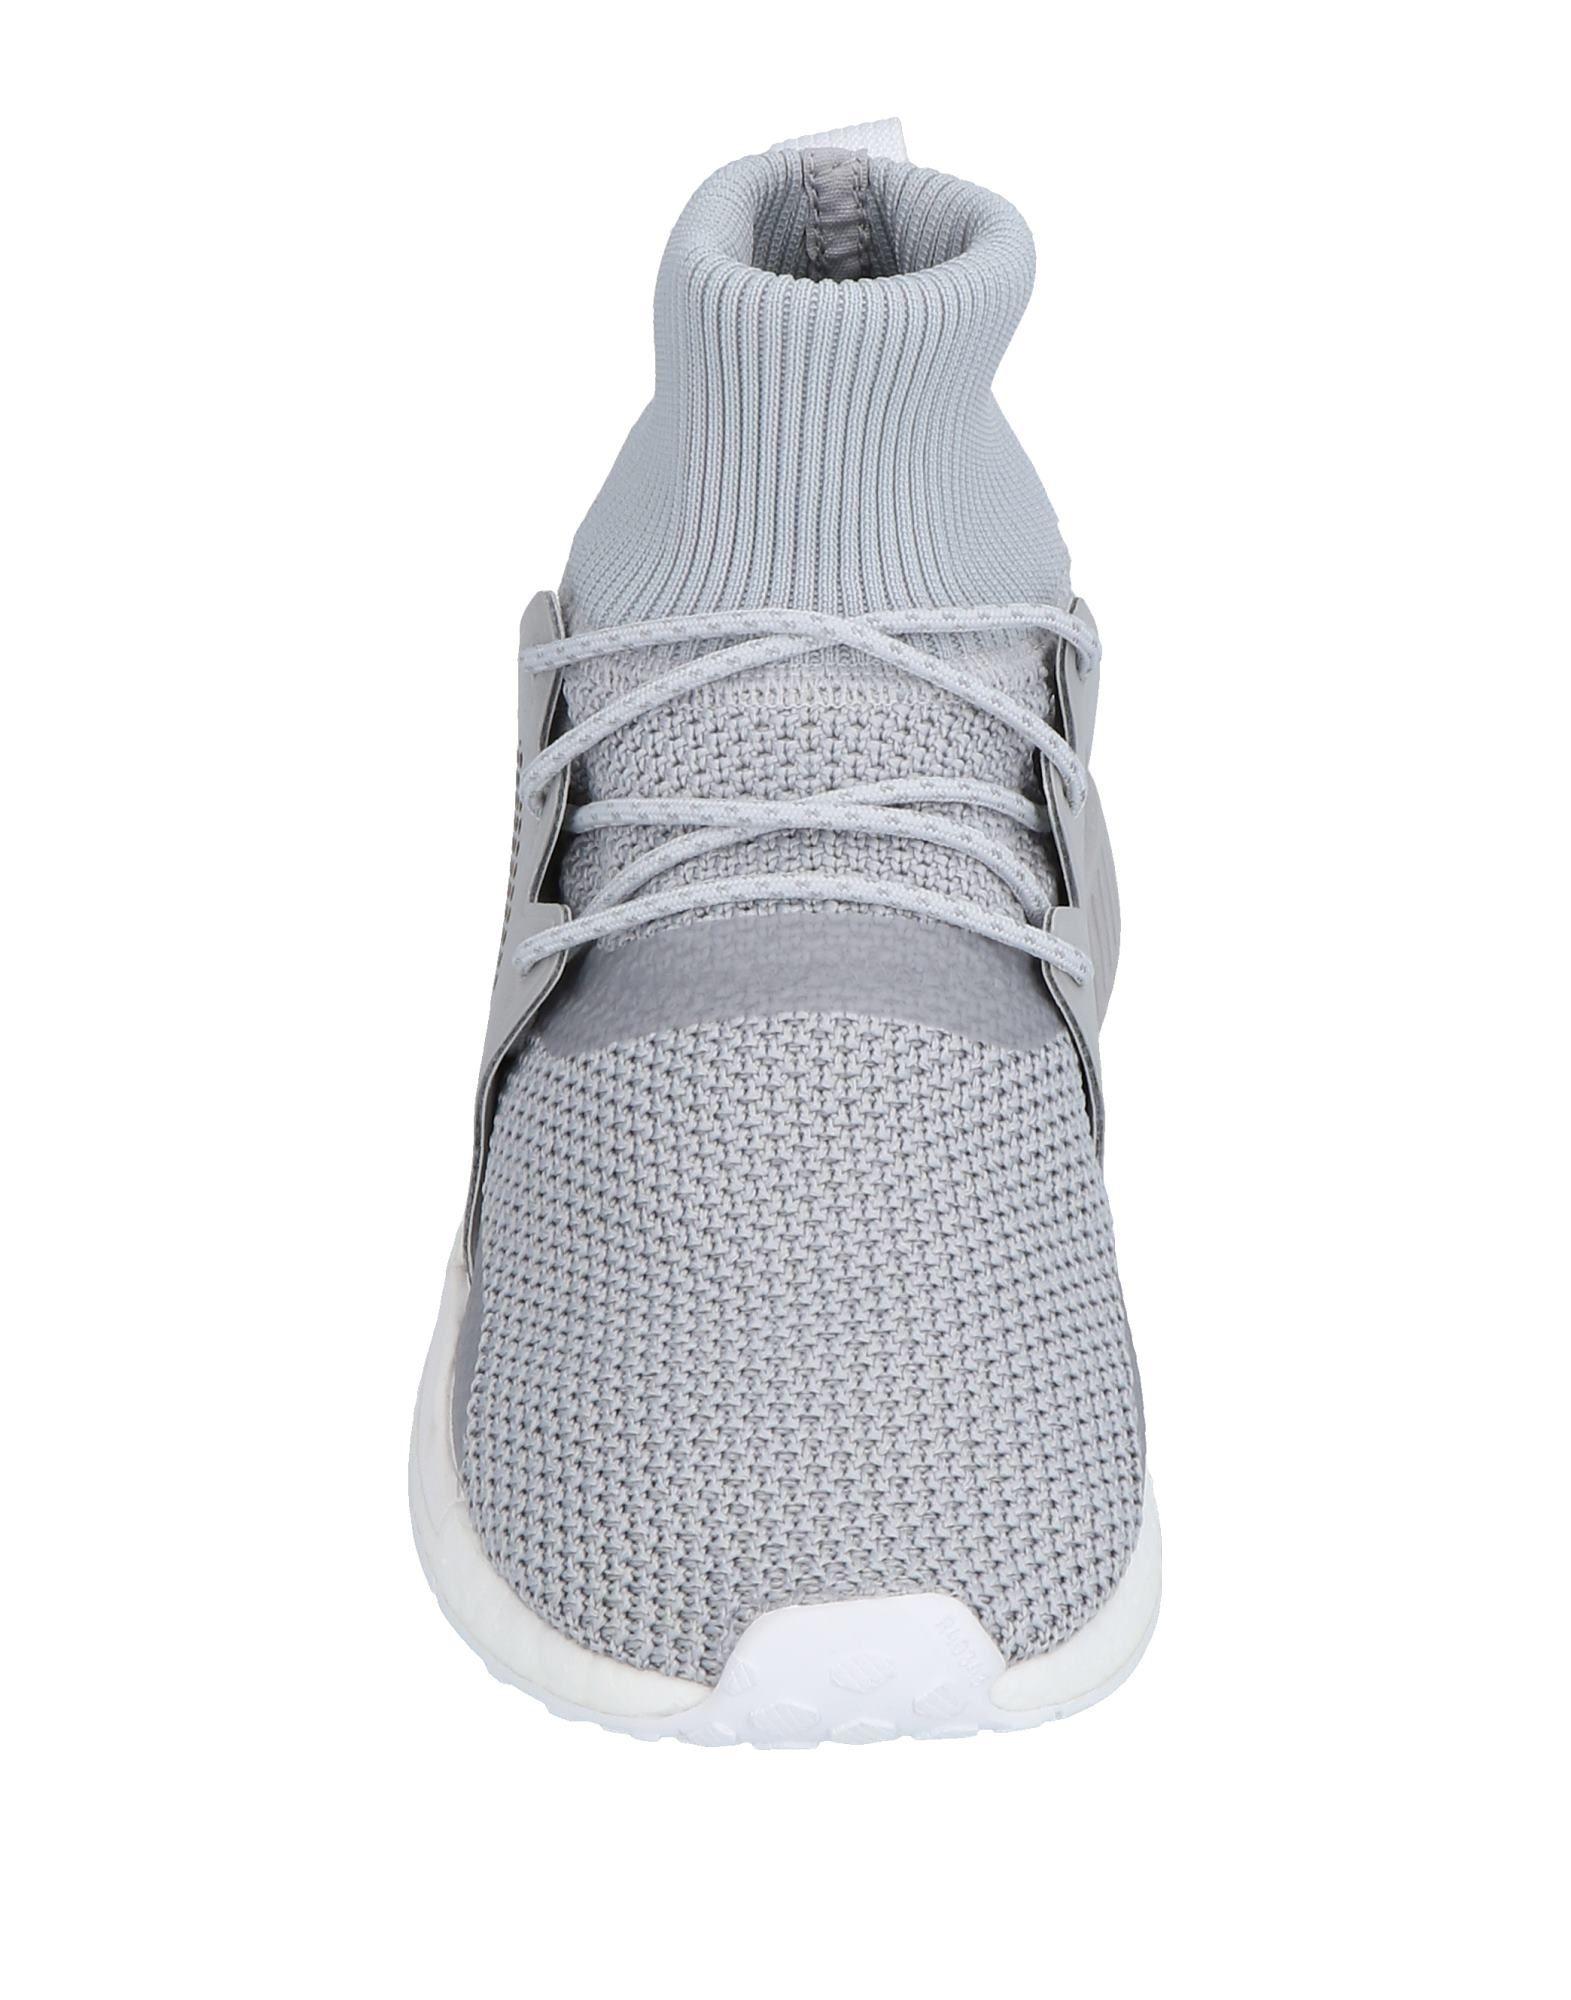 b431d874b245 ADIDAS ORIGINALS ΠΑΠΟΥΤΣΙΑ Χαμηλά sneakers